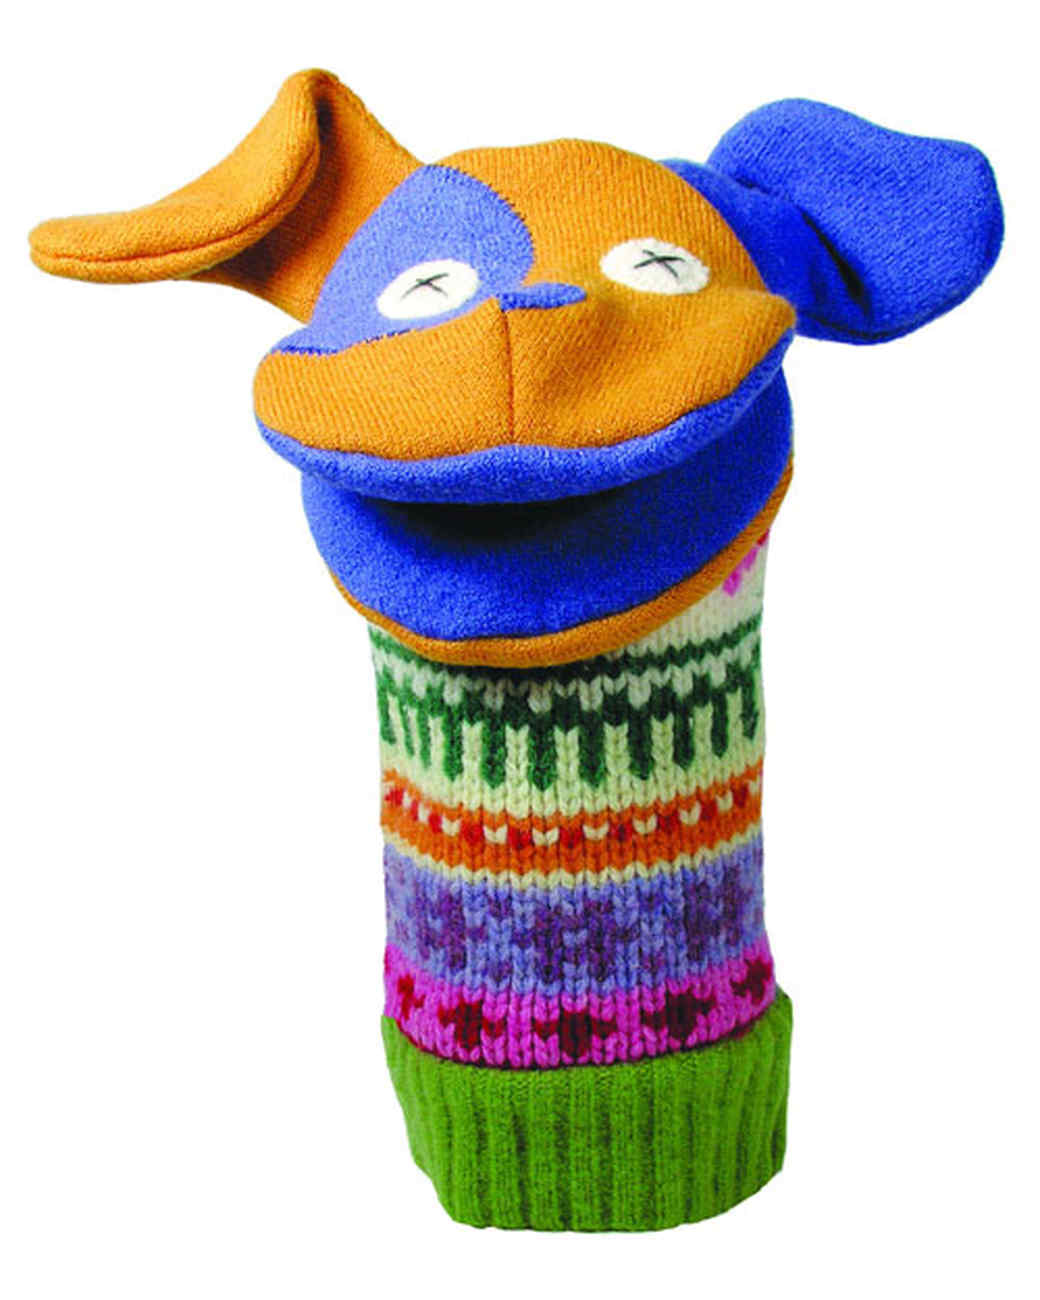 6088_012711_hand_puppet_dog.jpg